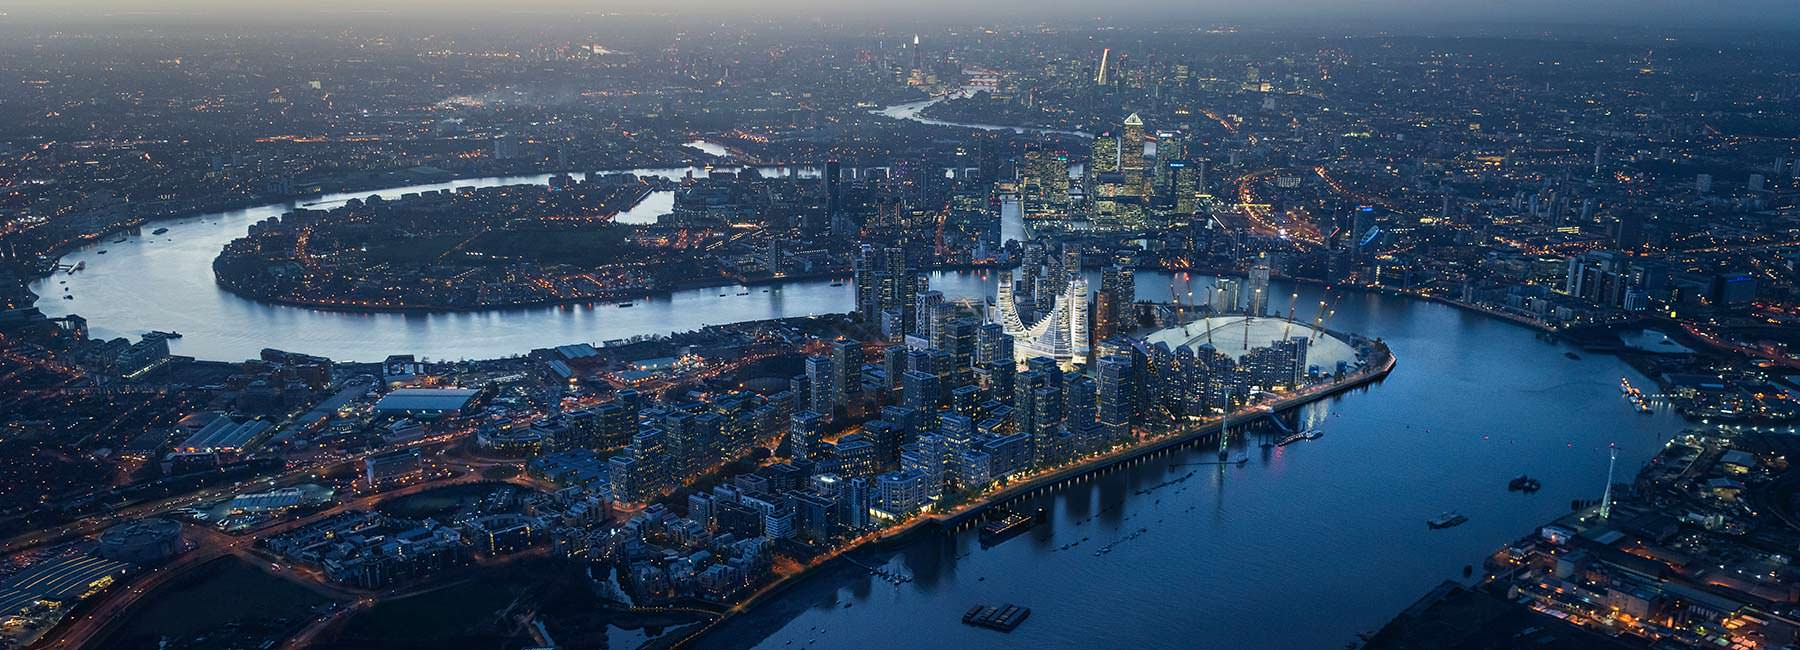 Три Башни в Лондоне. Проект Сантьяго Калатрава